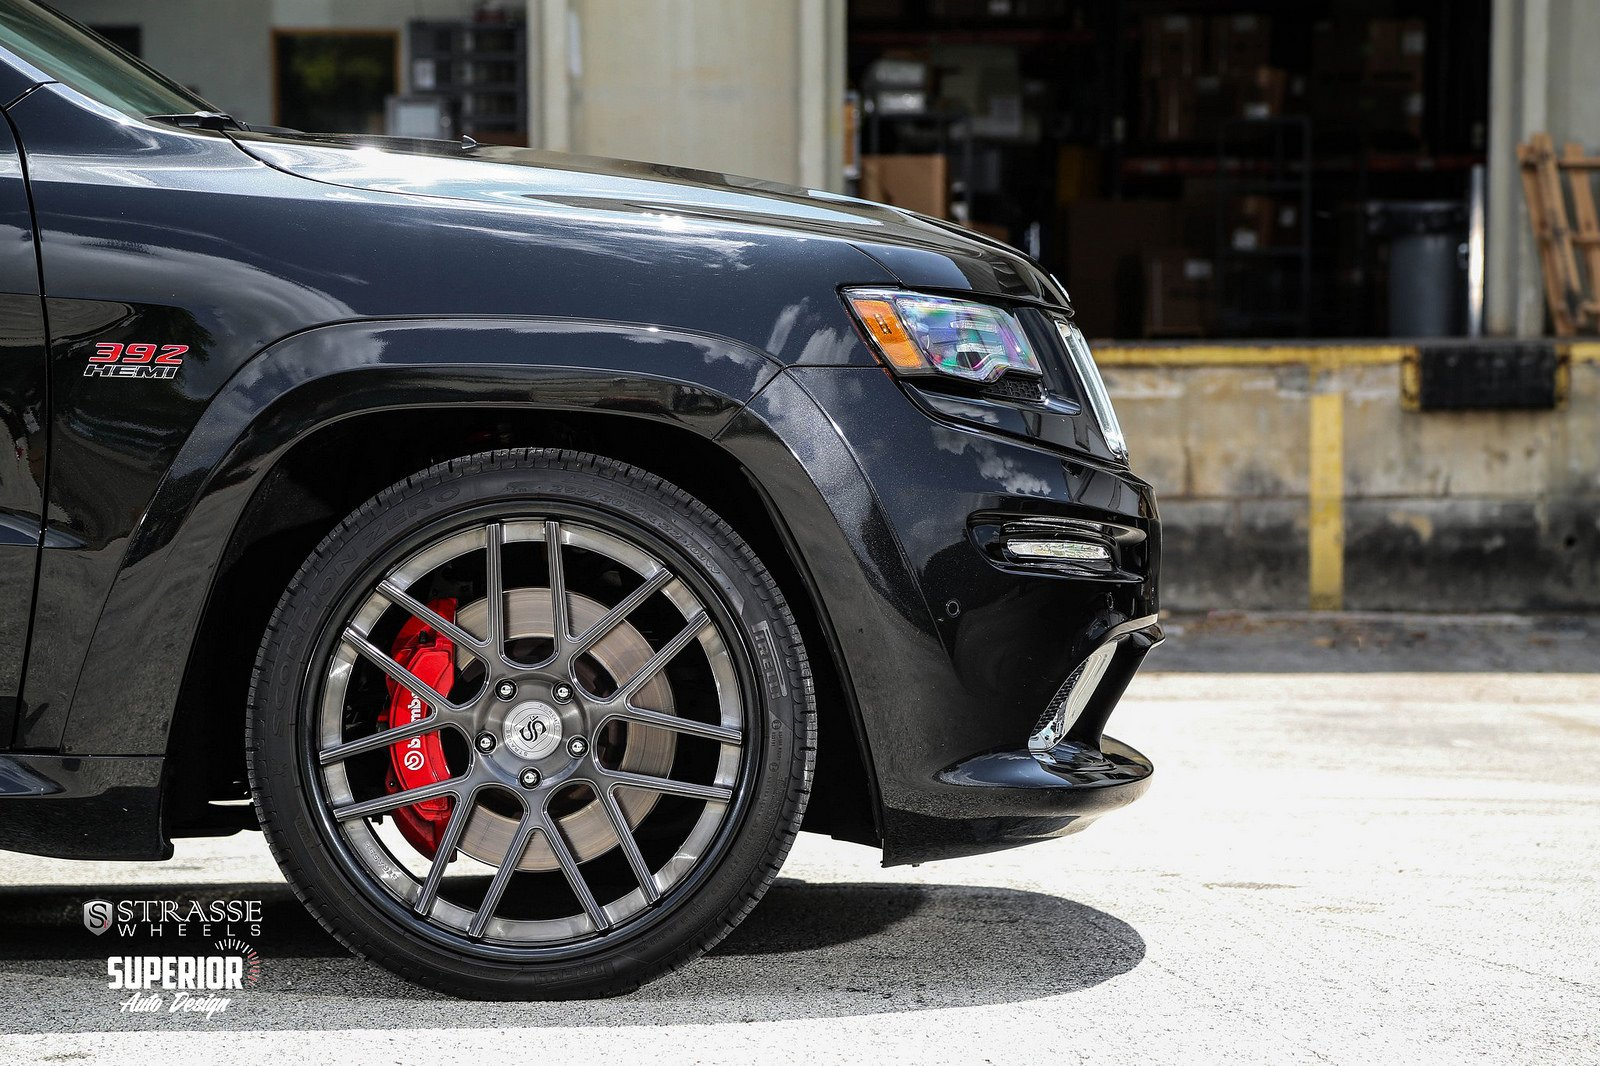 jeep grand cherokee srt8 Strasse Wheels tuning cars black wallpaper 1600x1066